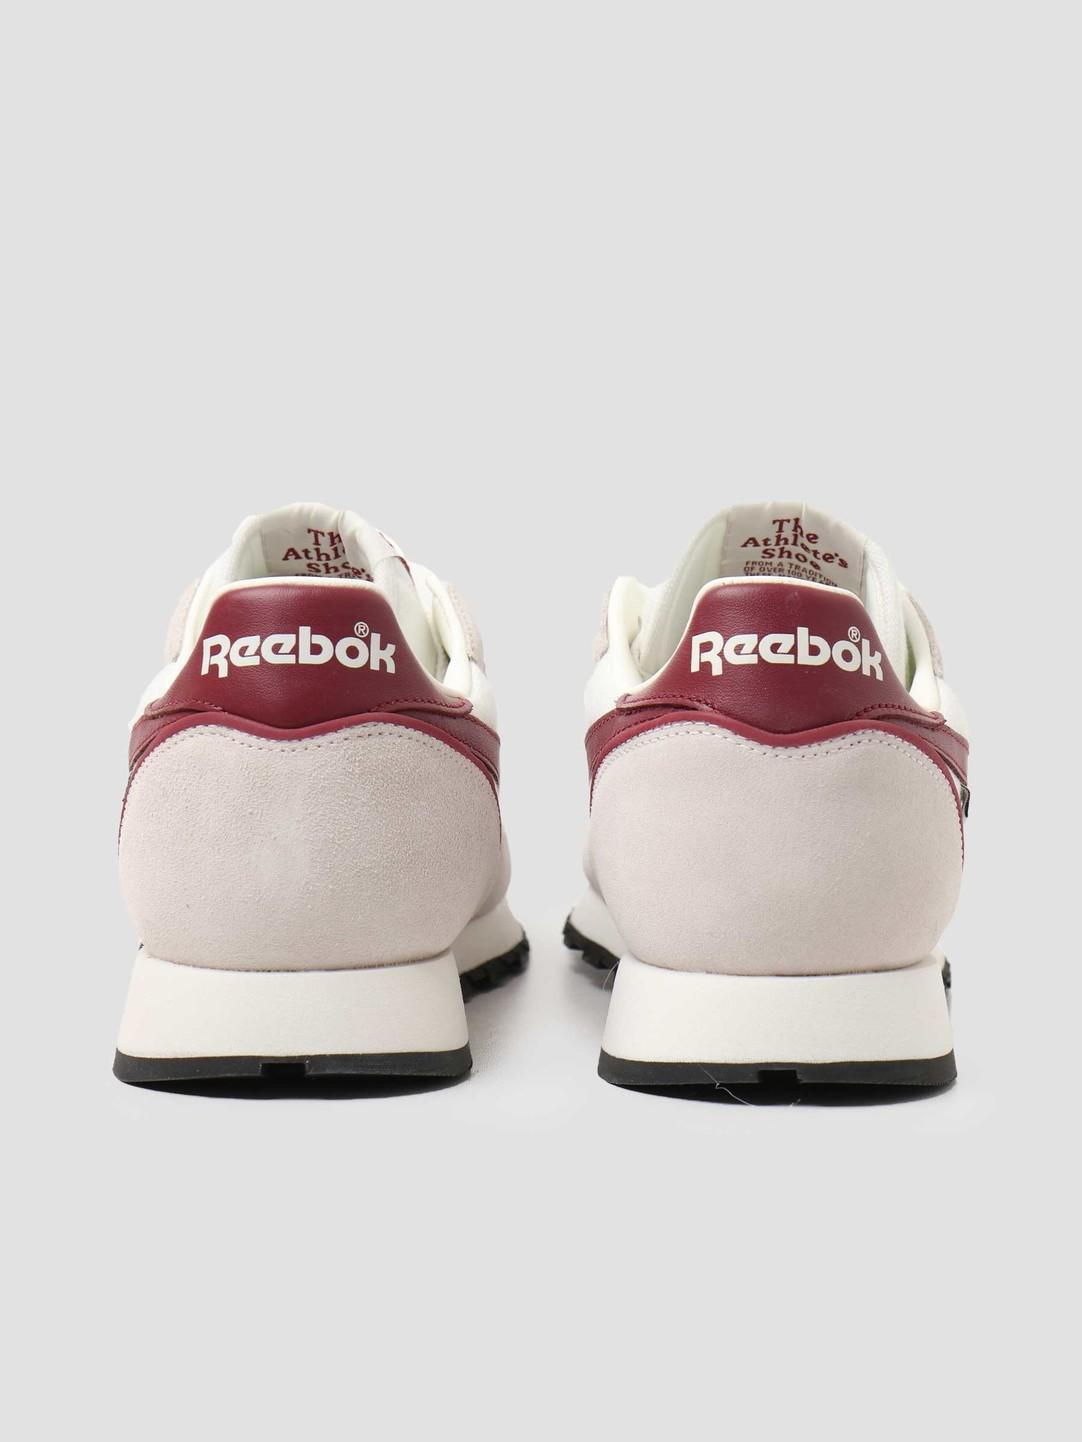 Reebok Reebok Classic Leather Chalk Burgundy Black H05011